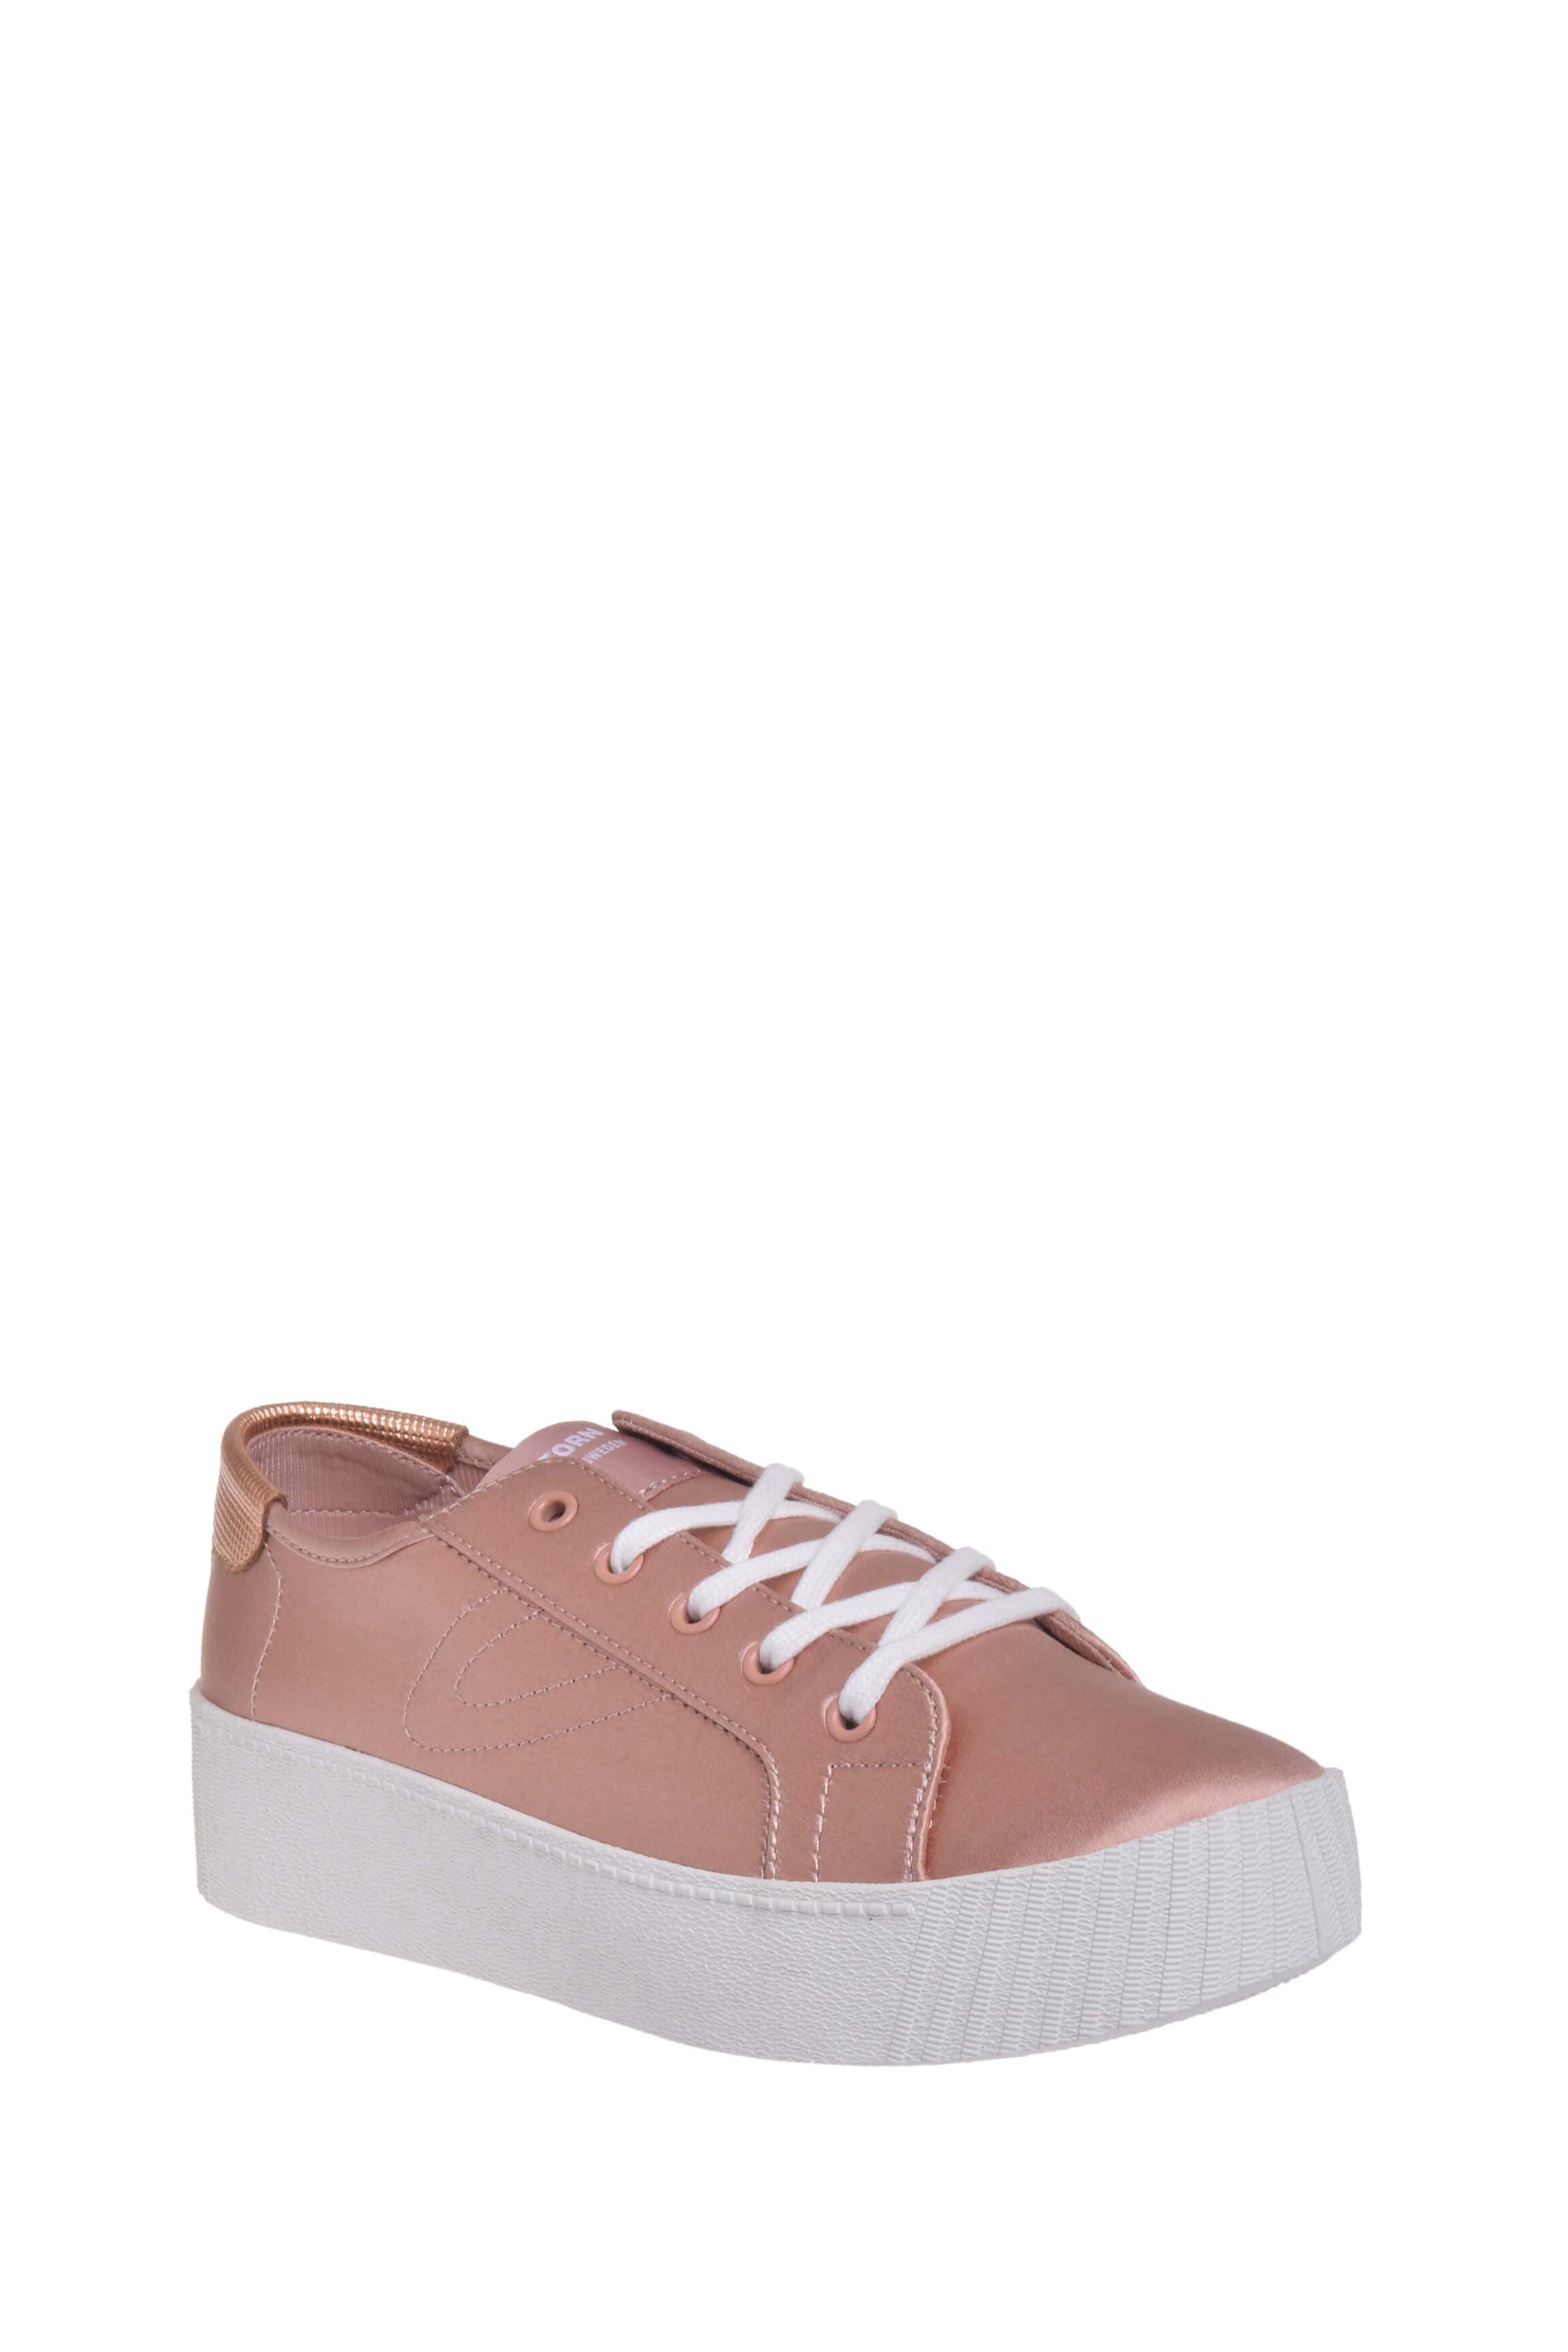 Tretorn W Blaire 7 Platform Sneaker Sand Satin by